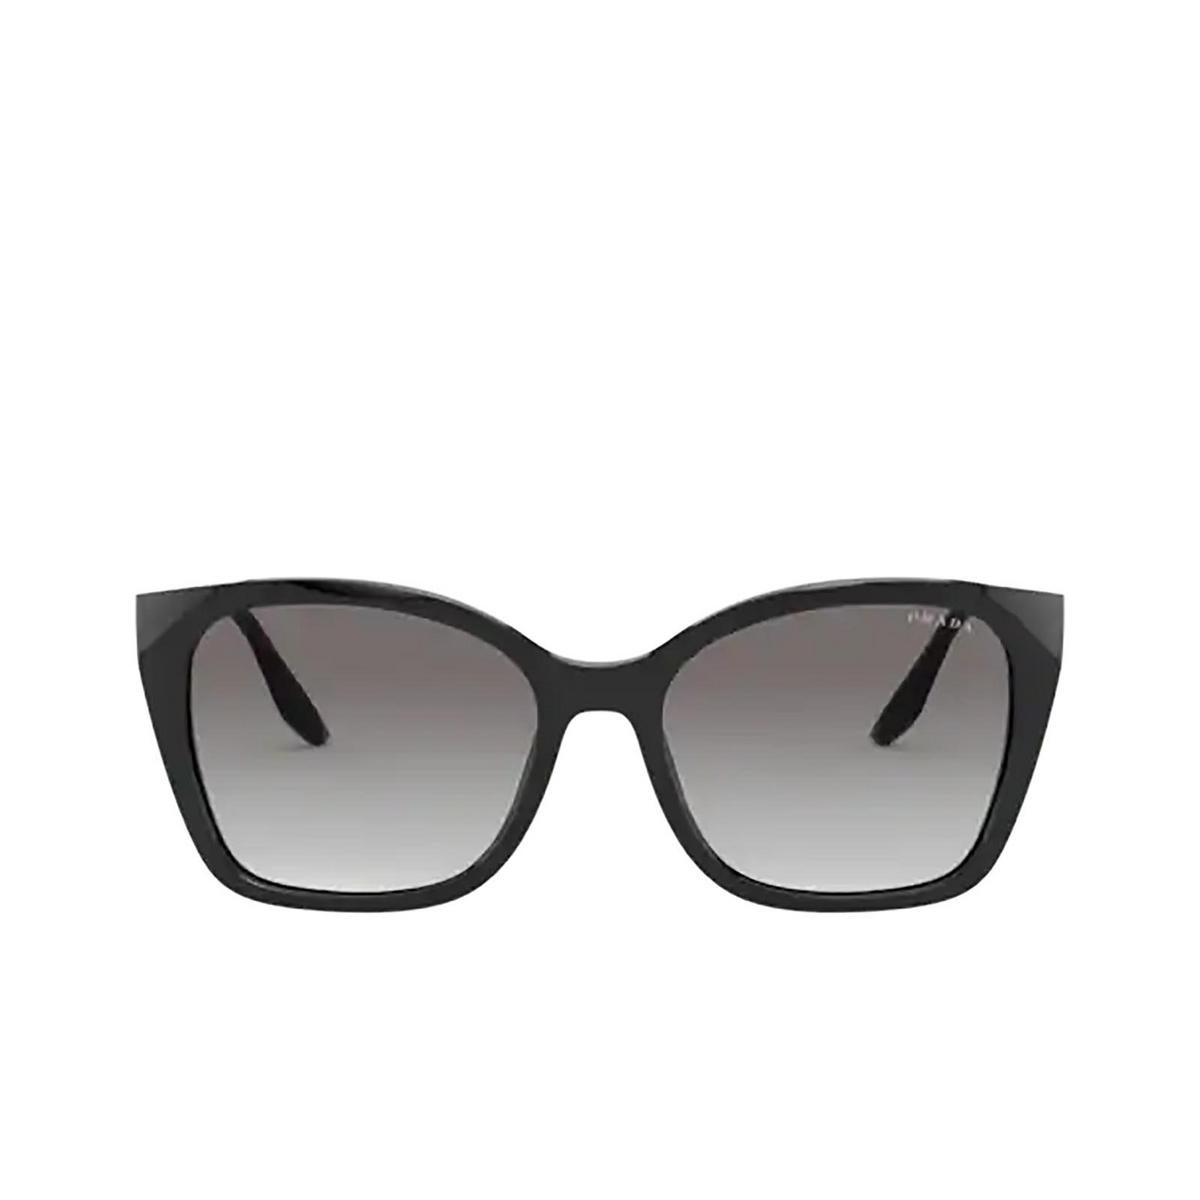 Prada® Cat-eye Sunglasses: PR 12XS color Black 1AB0A7 - front view.